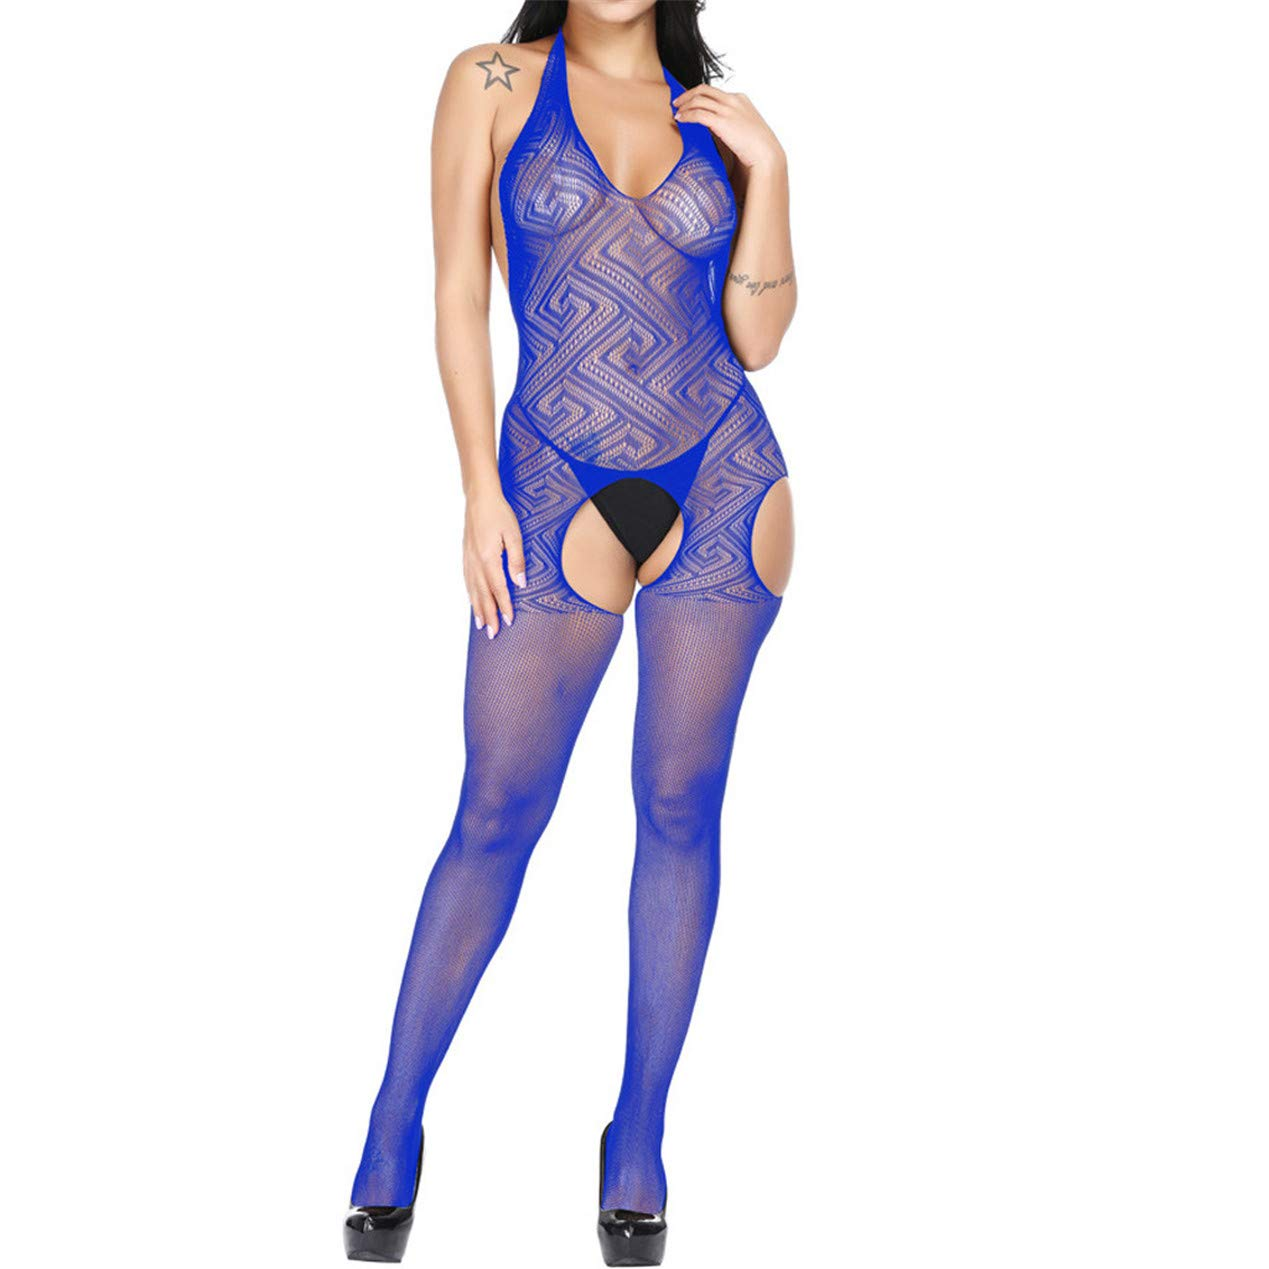 TIFENNY Women's Sexy Appeal Jumpsuit Silk Stockings Clubwear Tight High Elasticity Uniform Temptation Pants